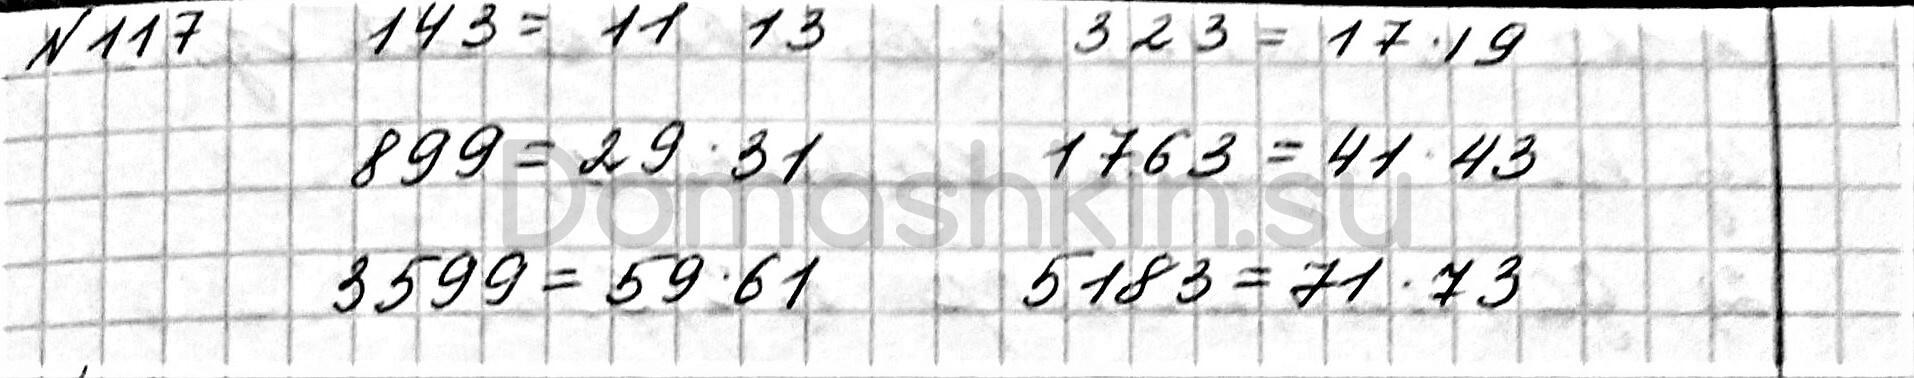 Математика 6 класс учебник Мерзляк номер 117 решение